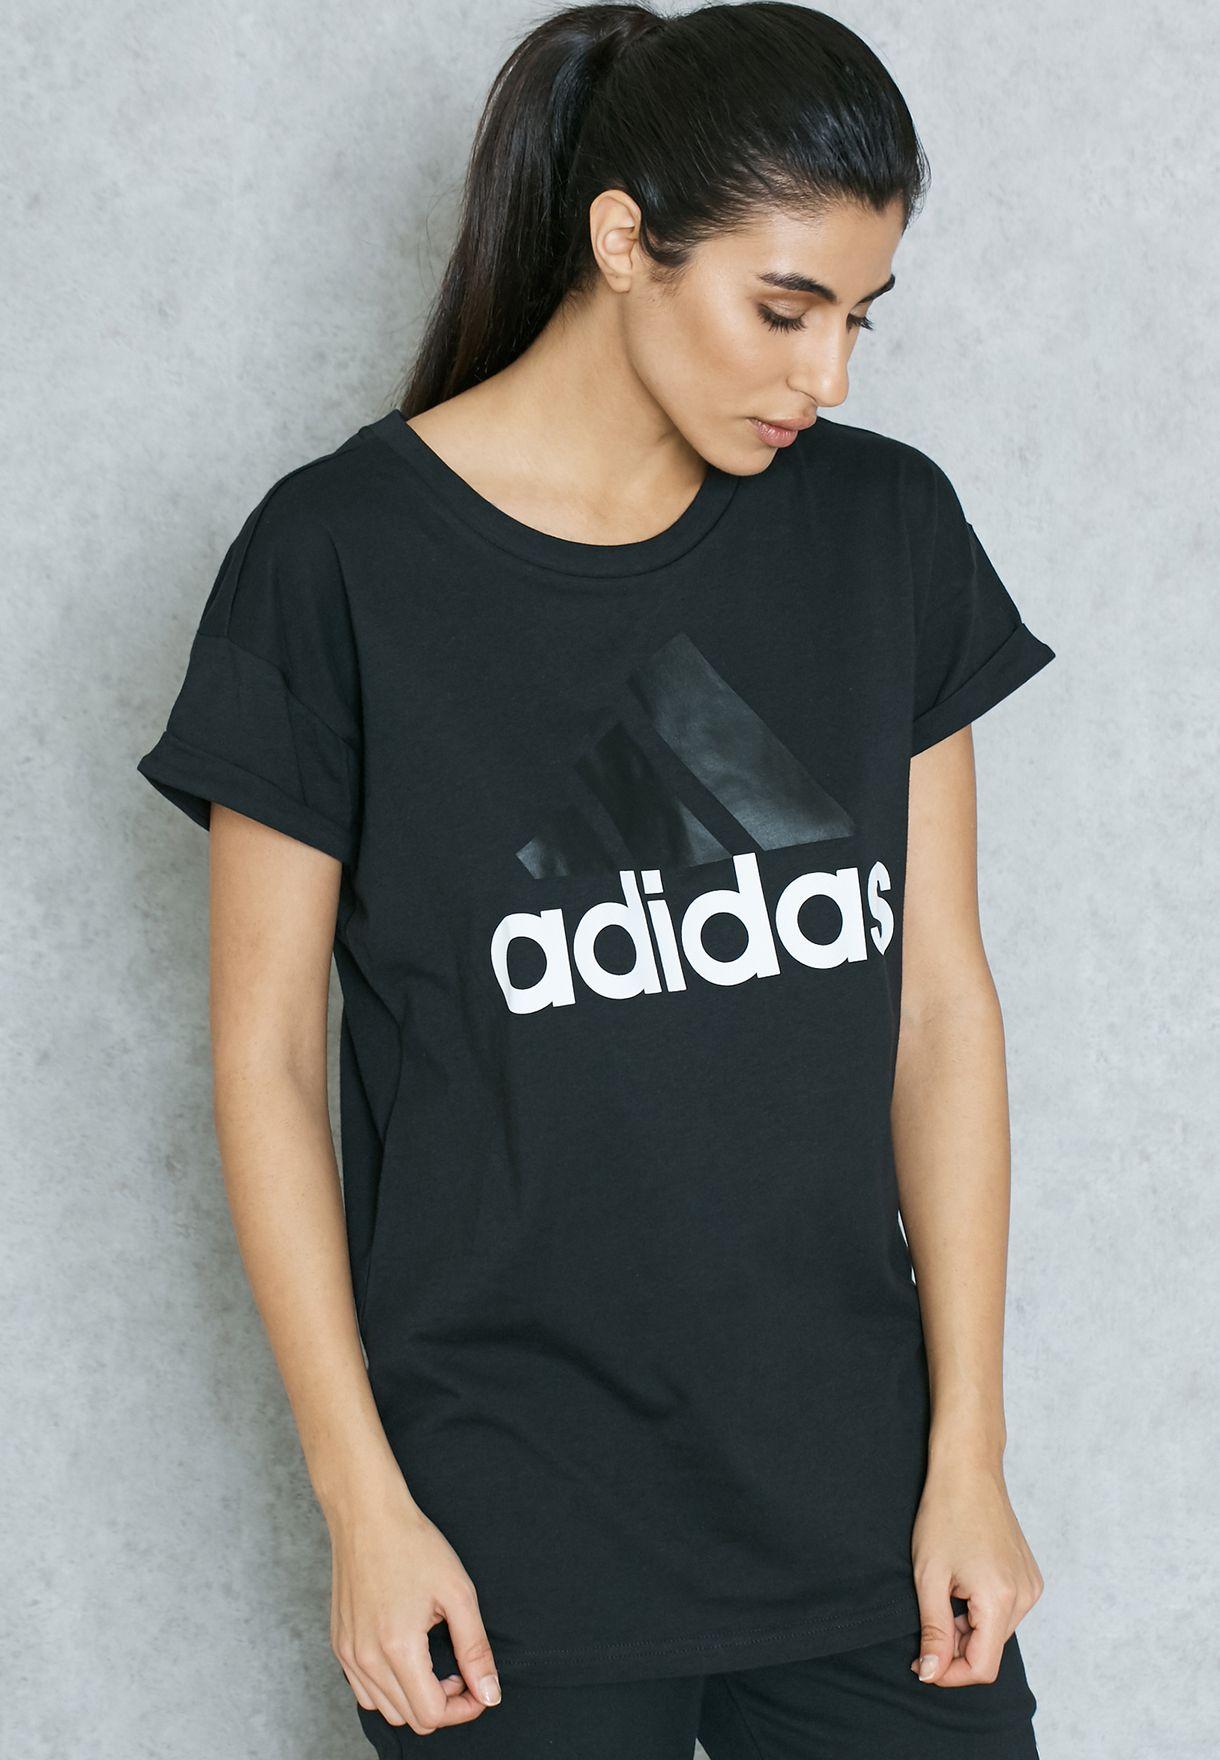 e16ed7a599 Adidas tričko ESS Linear LO S97222